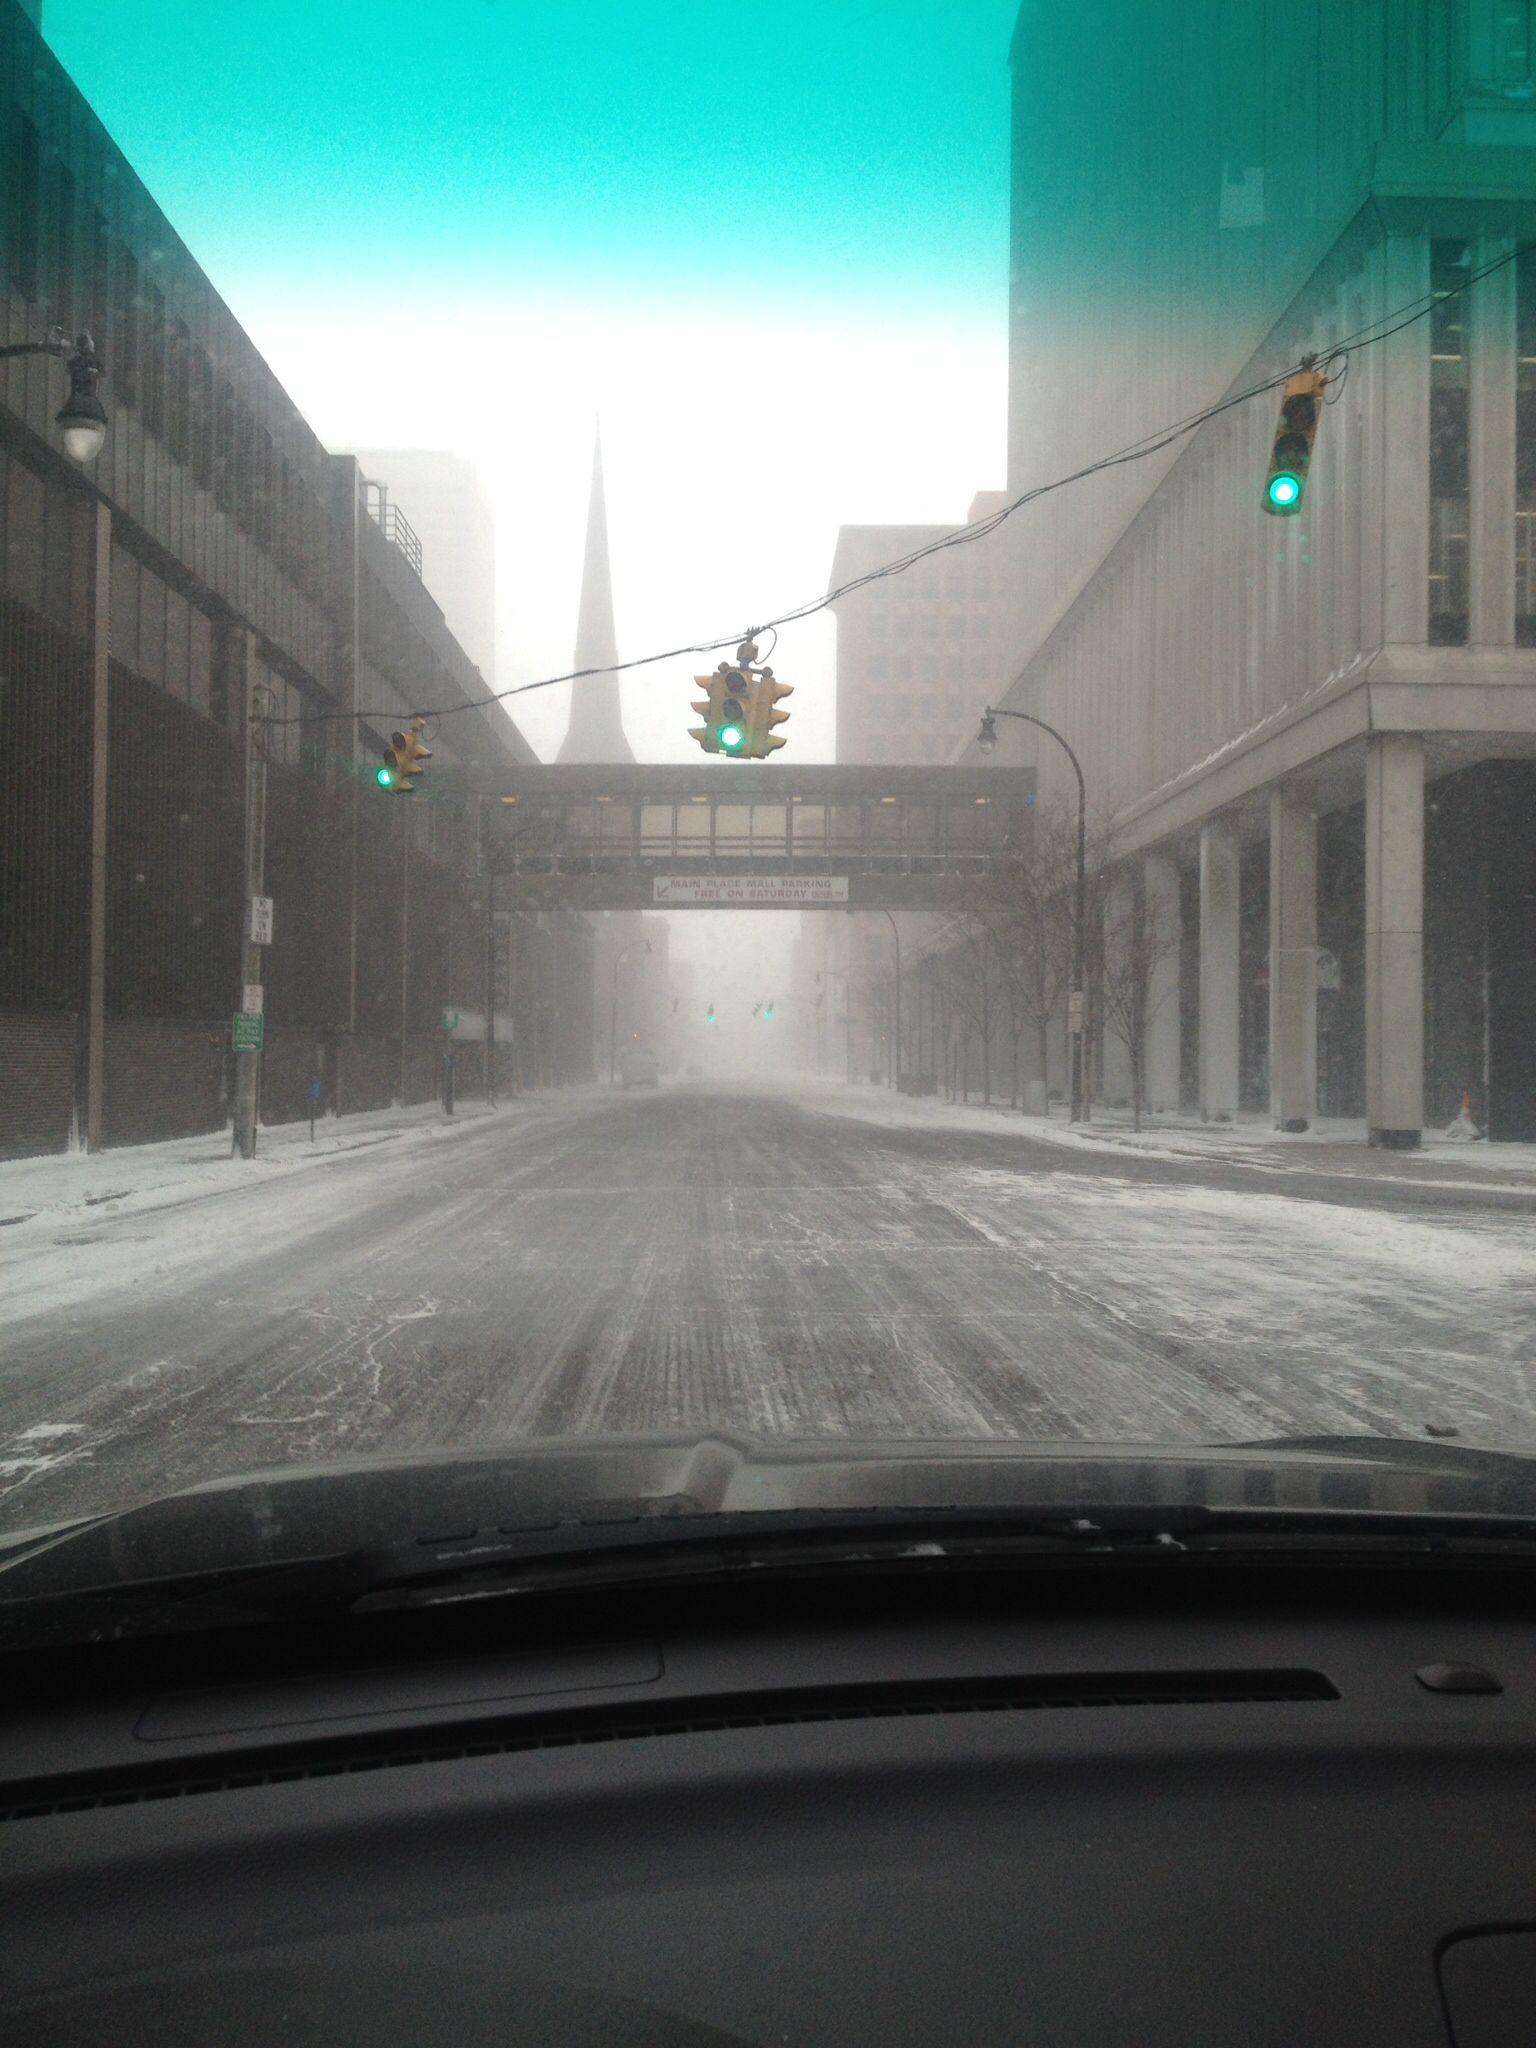 Franklin Street - Blizzard 2014